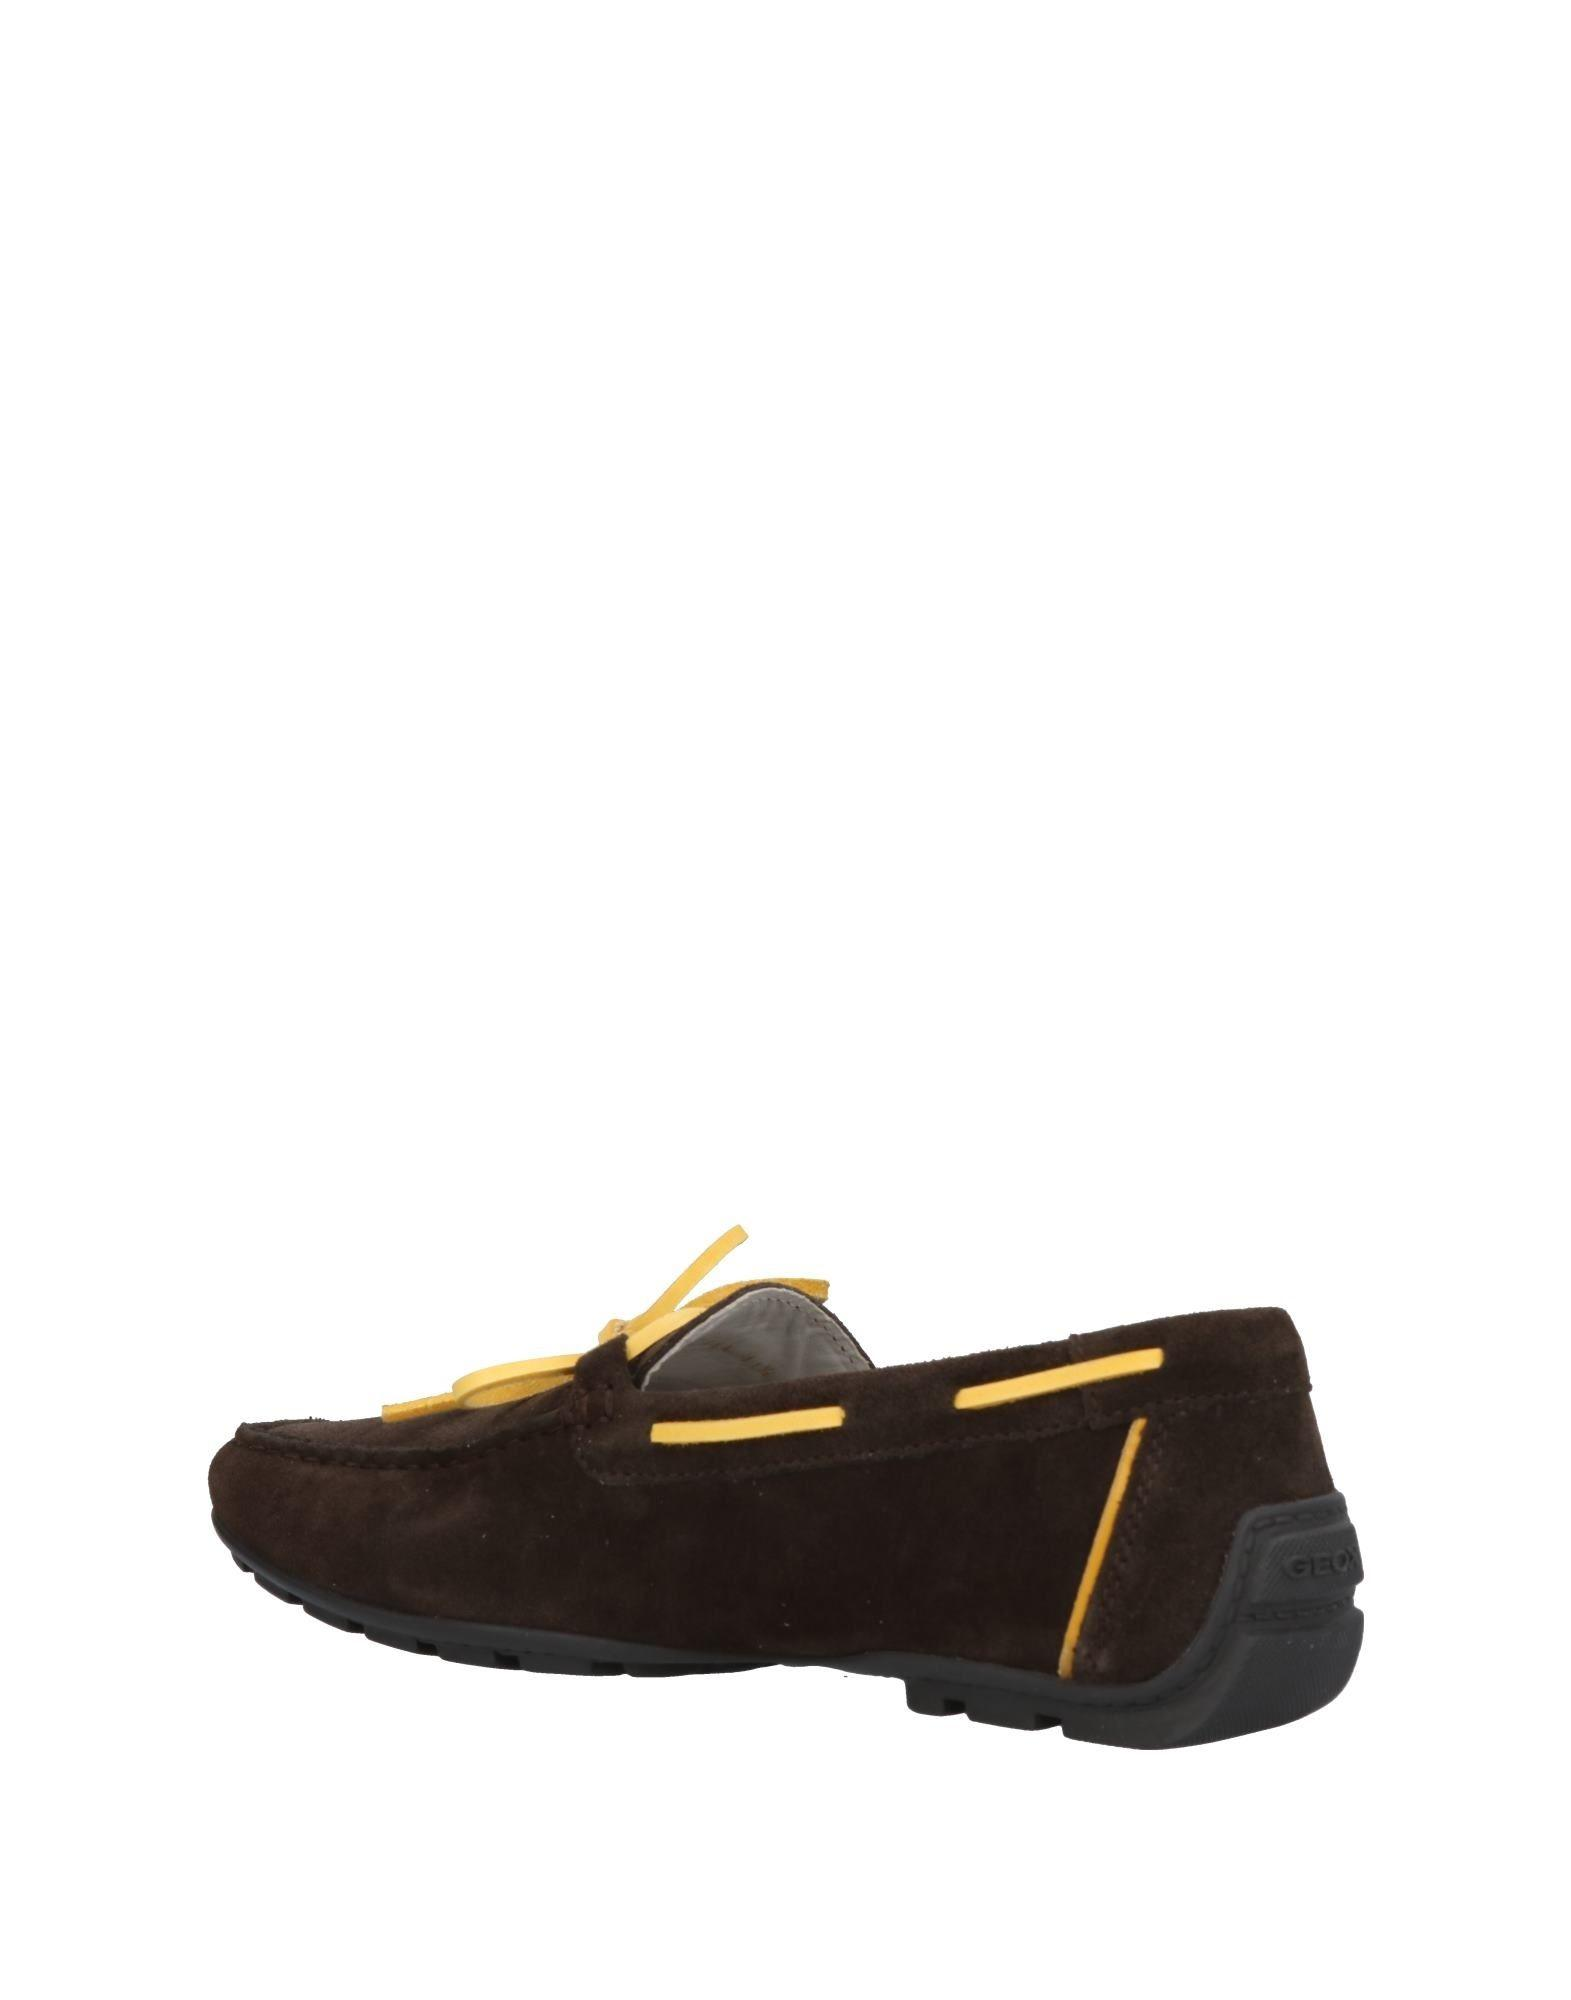 Geox Suede Loafer in Dark Brown (Brown) for Men